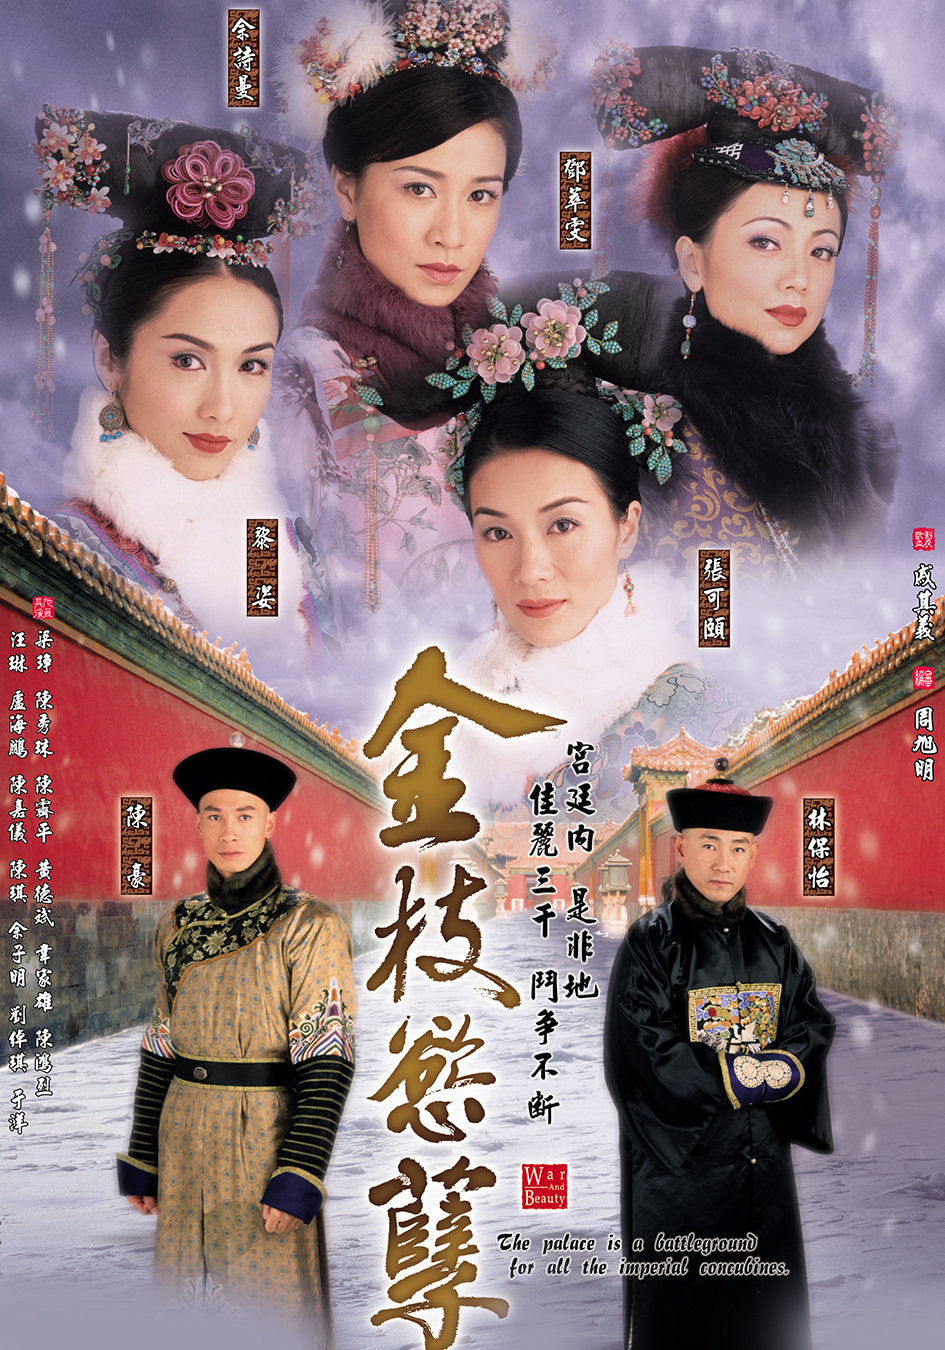 War and Beauty (2004) / 金枝慾孽